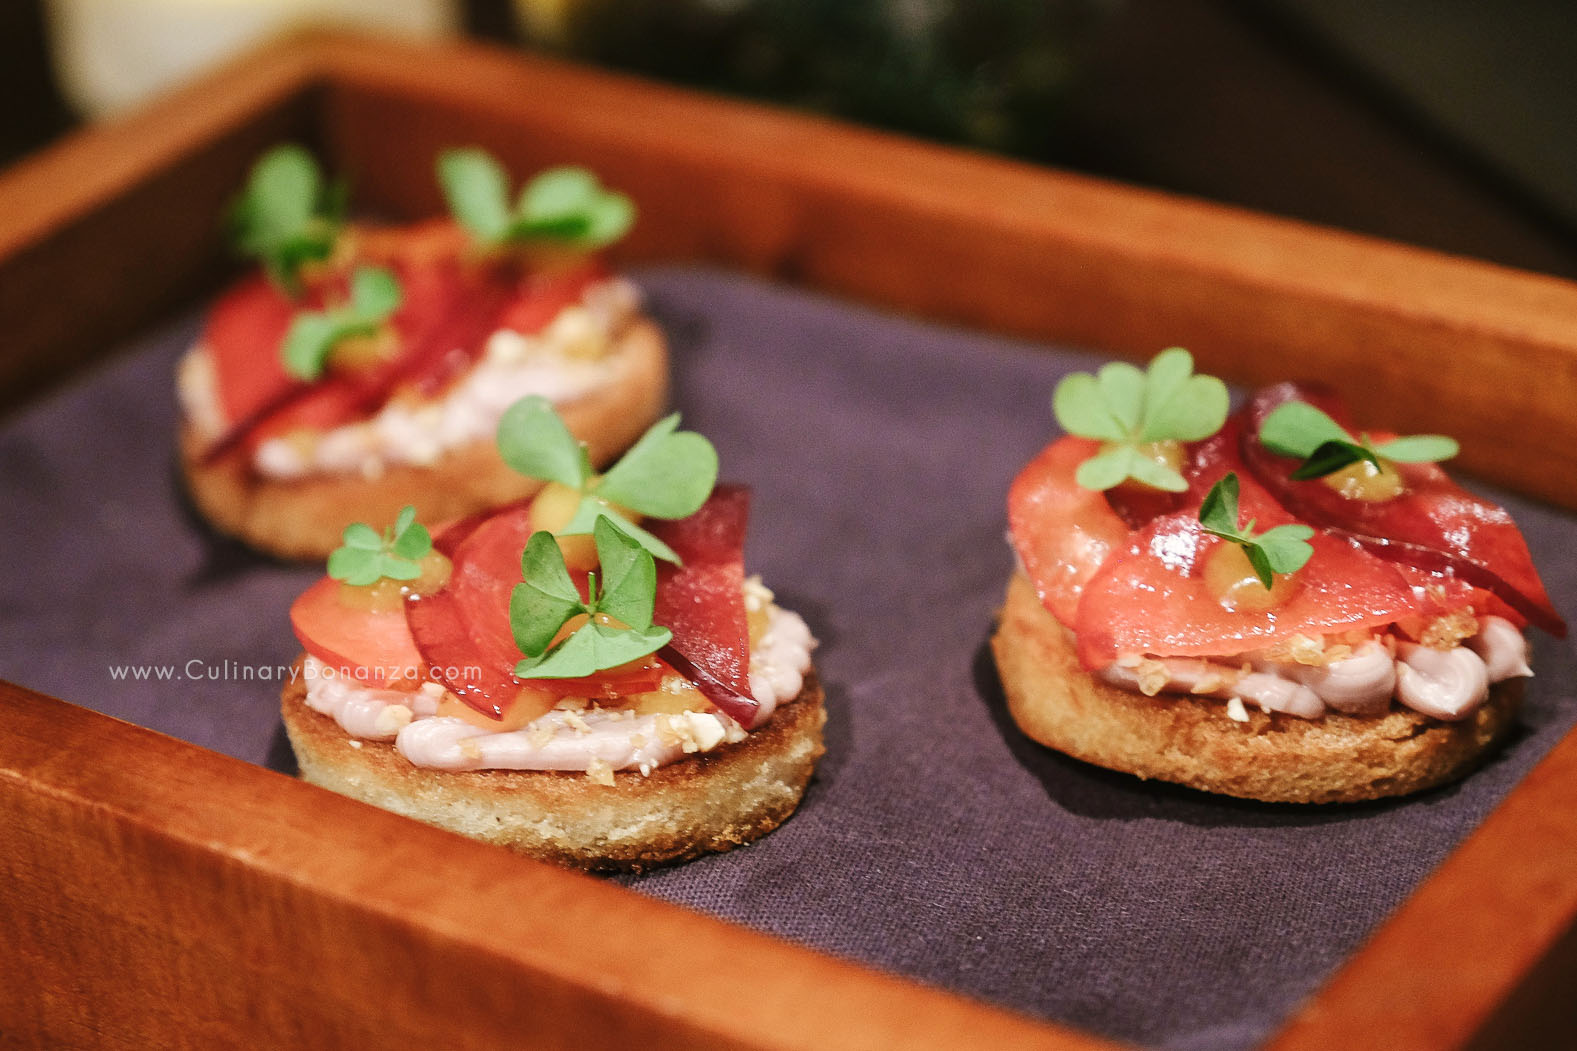 View Restaurant & Bar at Fairmont Hotel Jakarta by Chef Hans Christian (www.culinarybonanza.com)